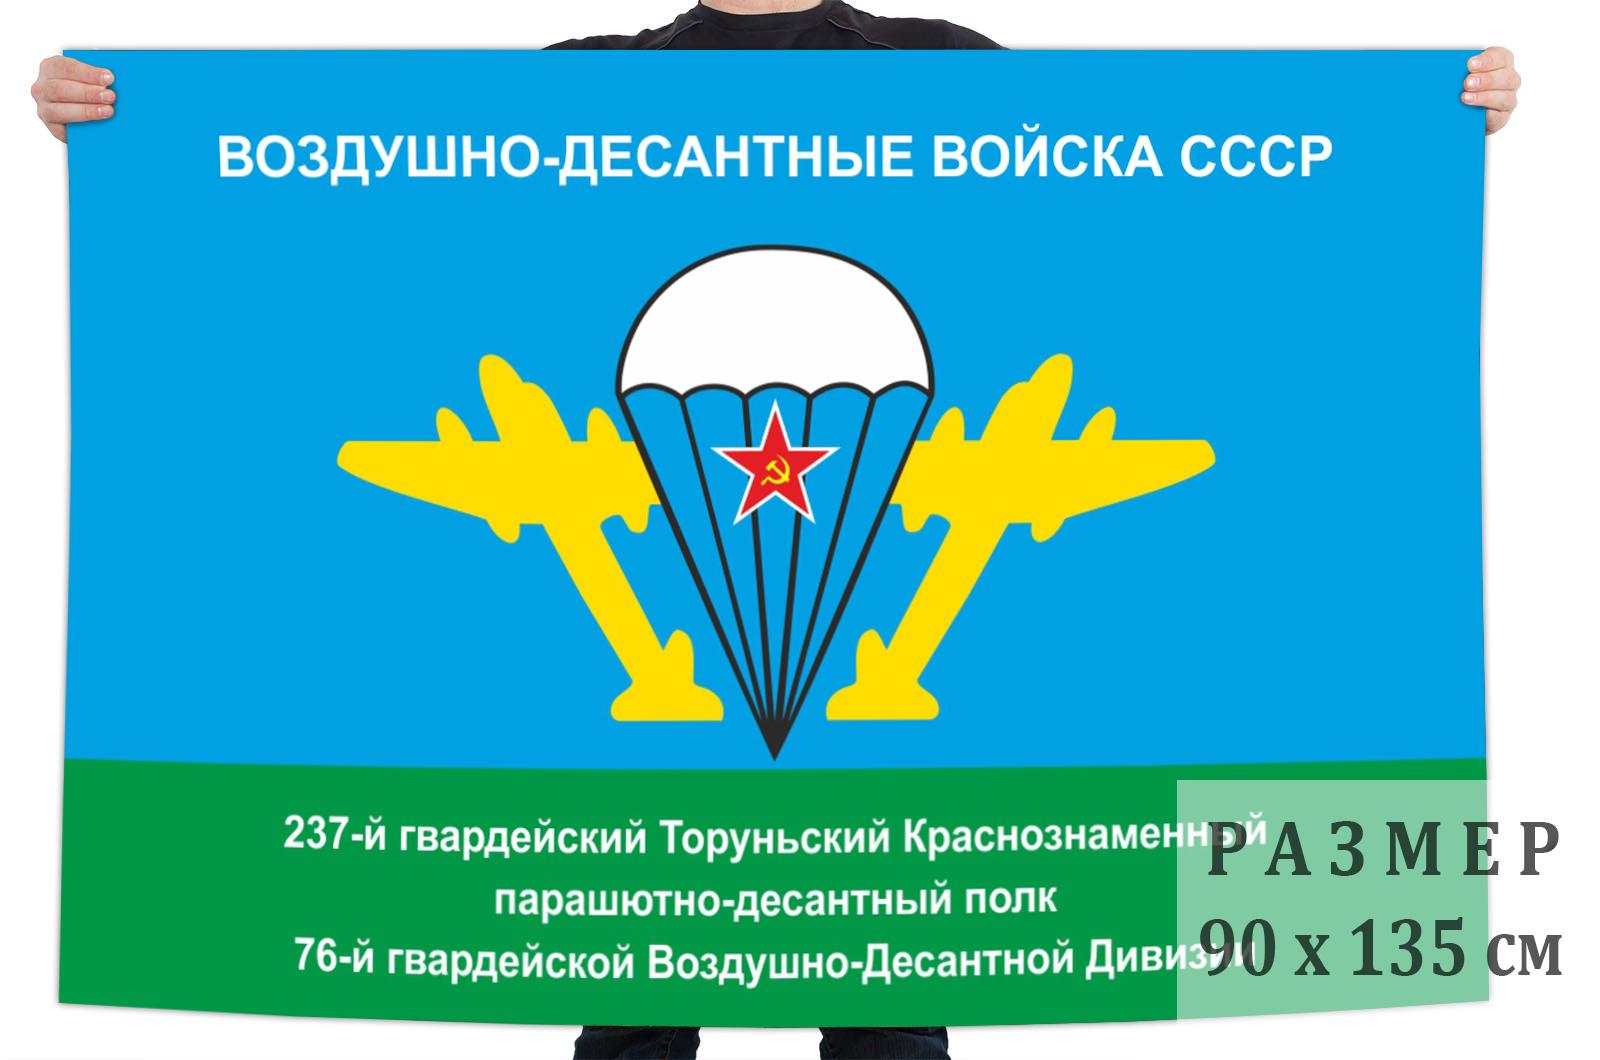 Флаг 237-го гв. парашютно-десантного полка ВДВ